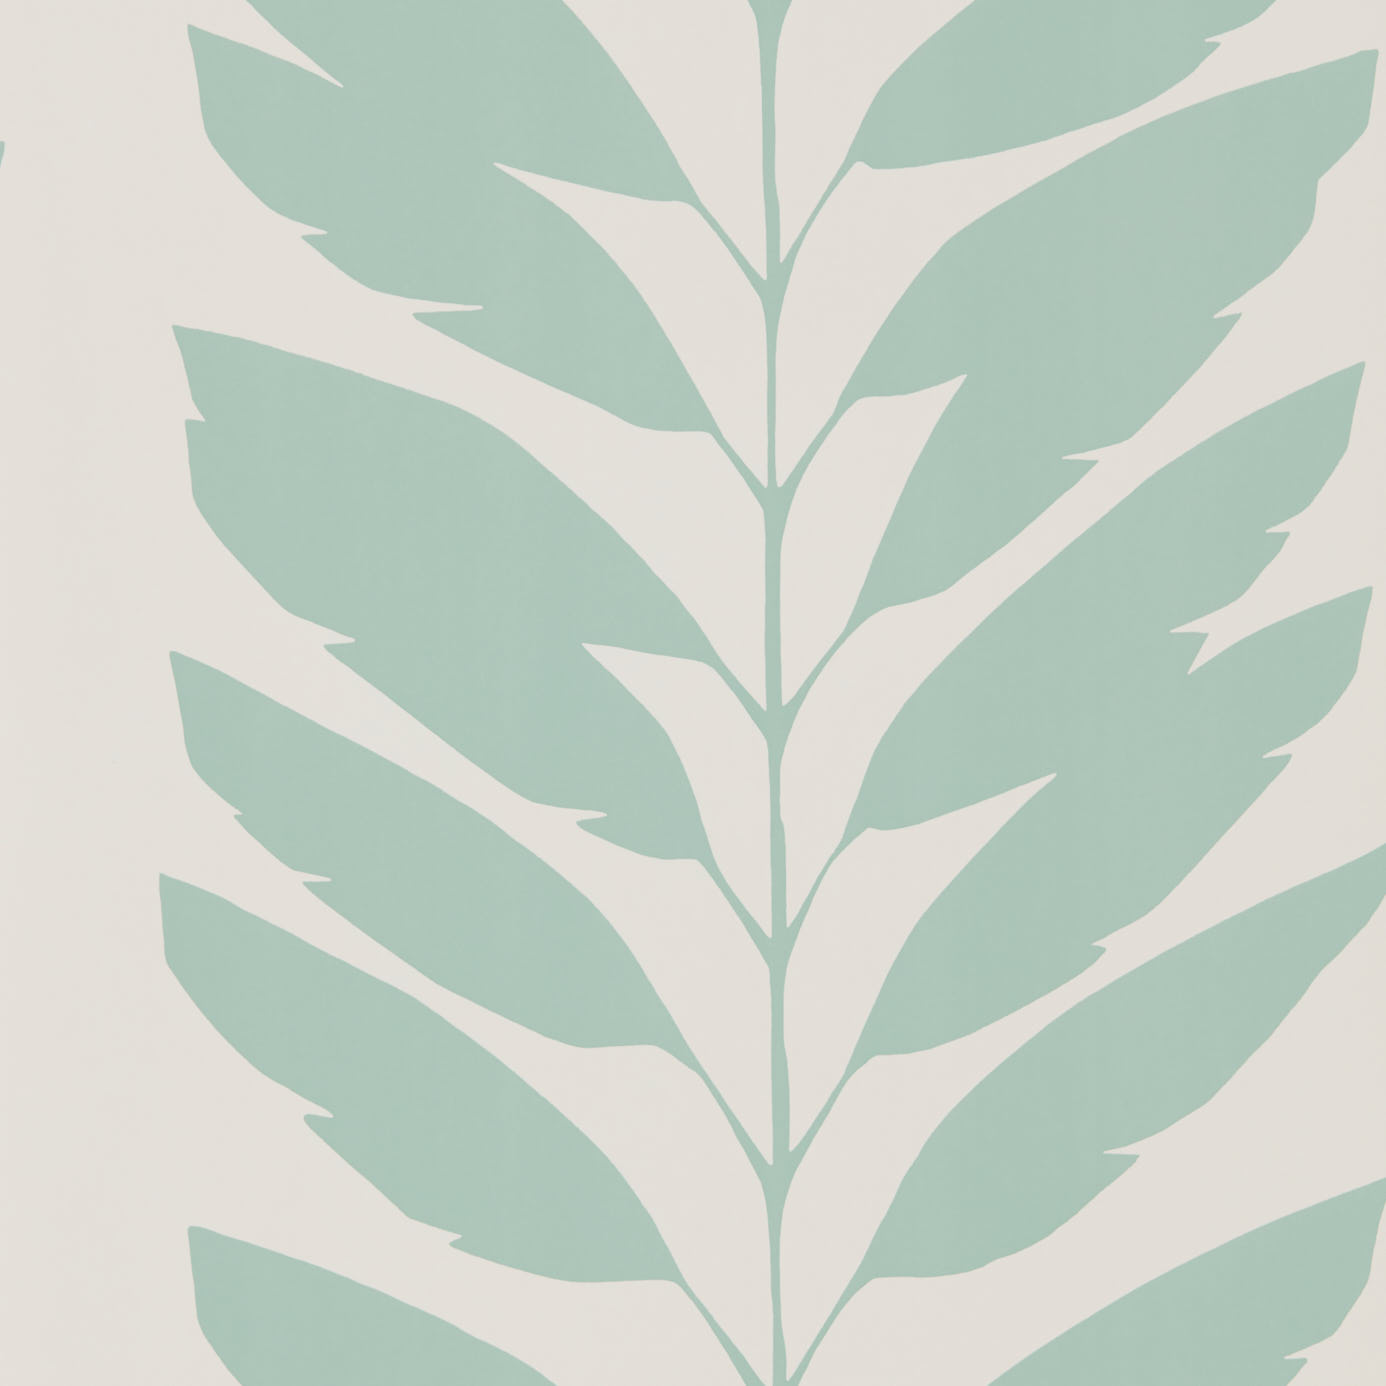 Английские обои Scion,  коллекция Lohko, артикул111309